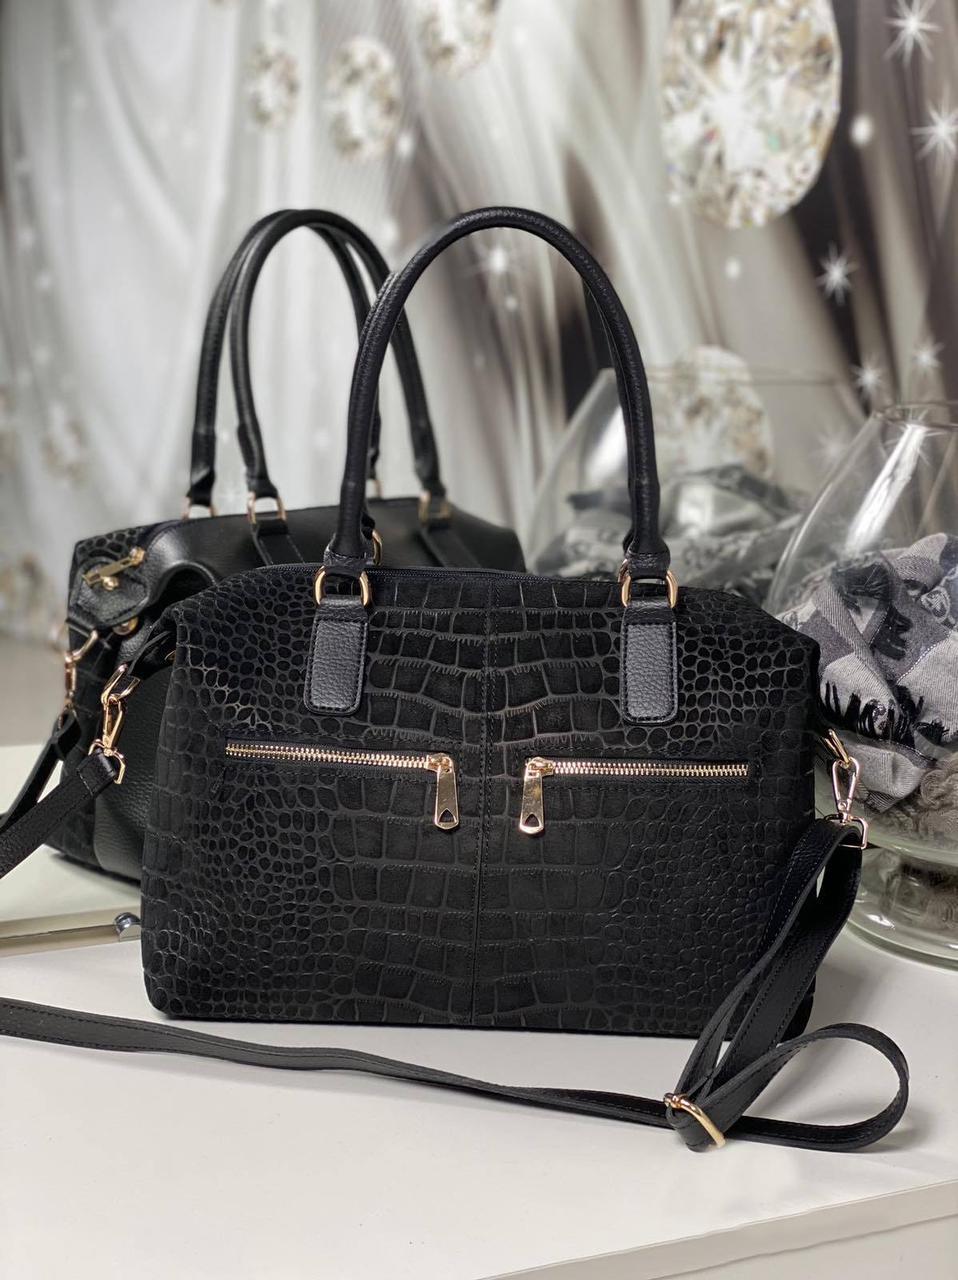 Большая замшевая женская сумка черная стильная городская натуральная замша+кожзам